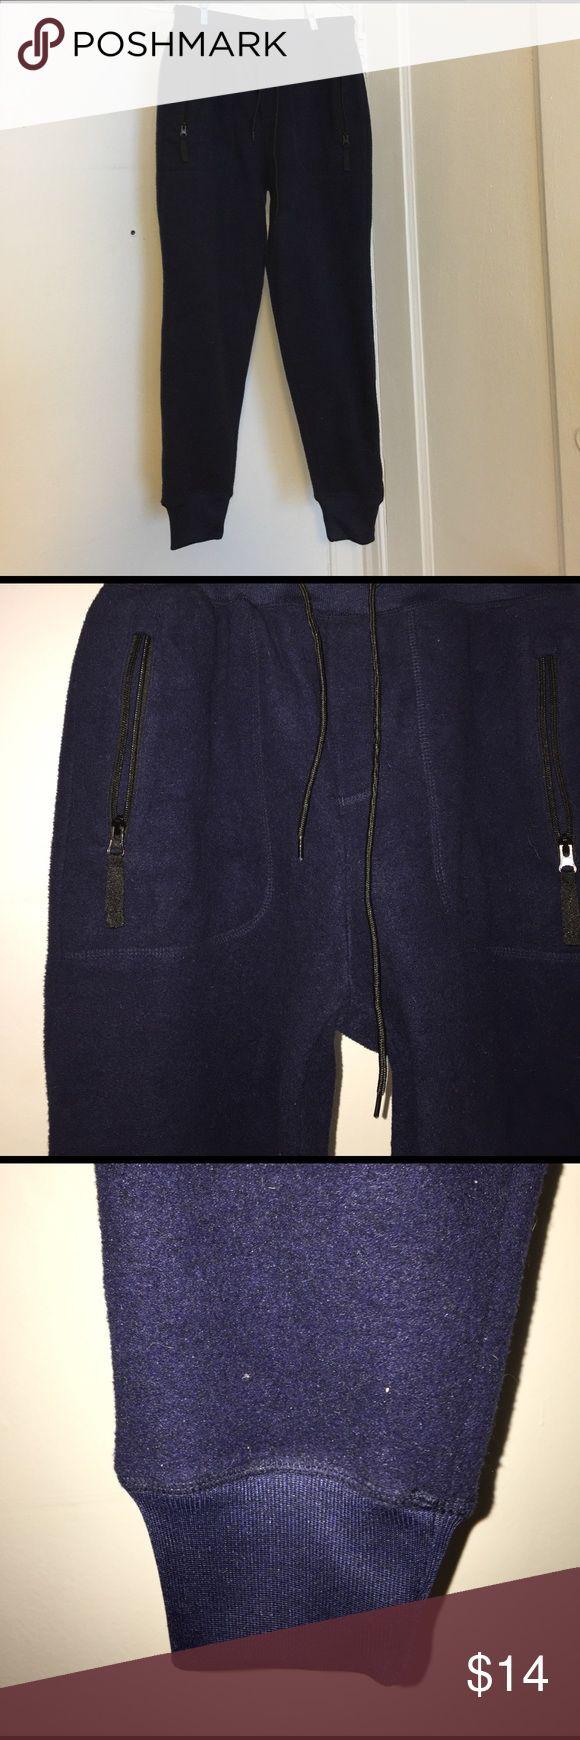 BDG Men's Navy Blue Fleece Jogger Urban Outfitters Navy Blue, Fleece Jogger, BDG from Urban Outfitters. Super soft, comfy, and warm! Barely worn! Urban Outfitters Pants Sweatpants & Joggers